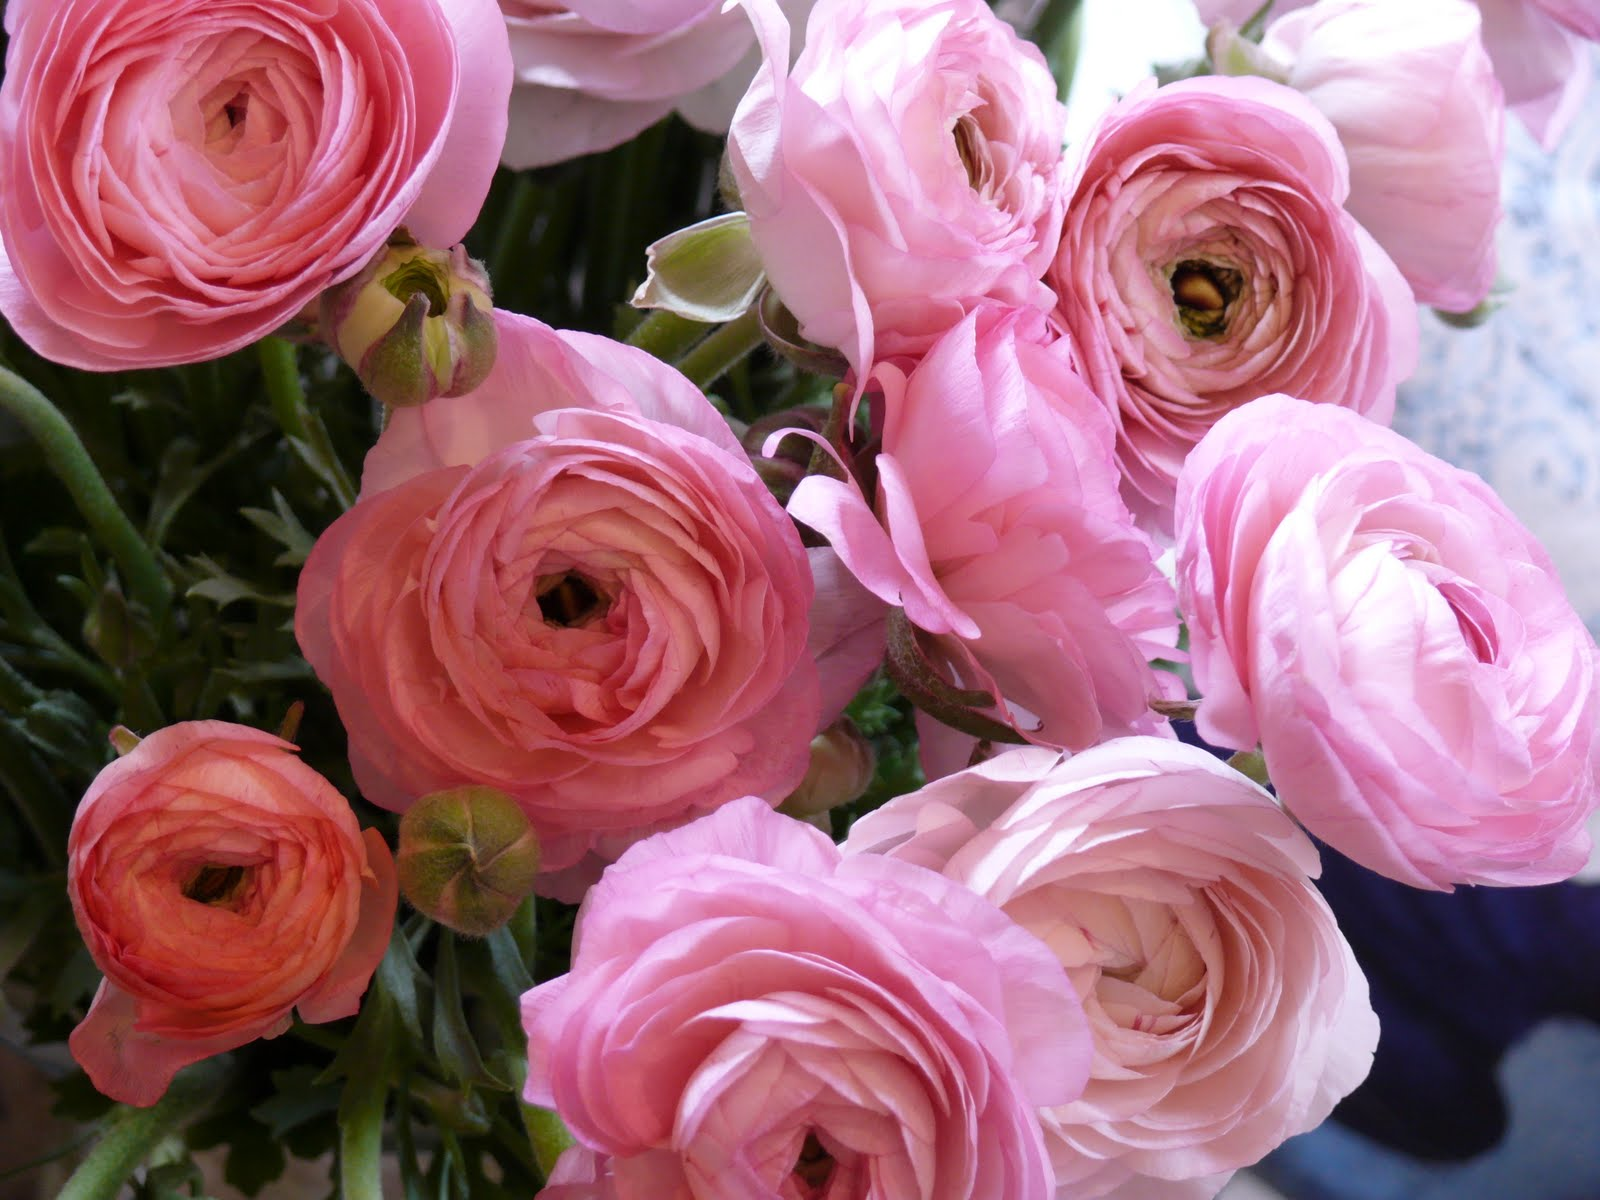 Pink Fall Wallpaper Hd La Fleur Vintage Ooh La La Pink Ranunculus